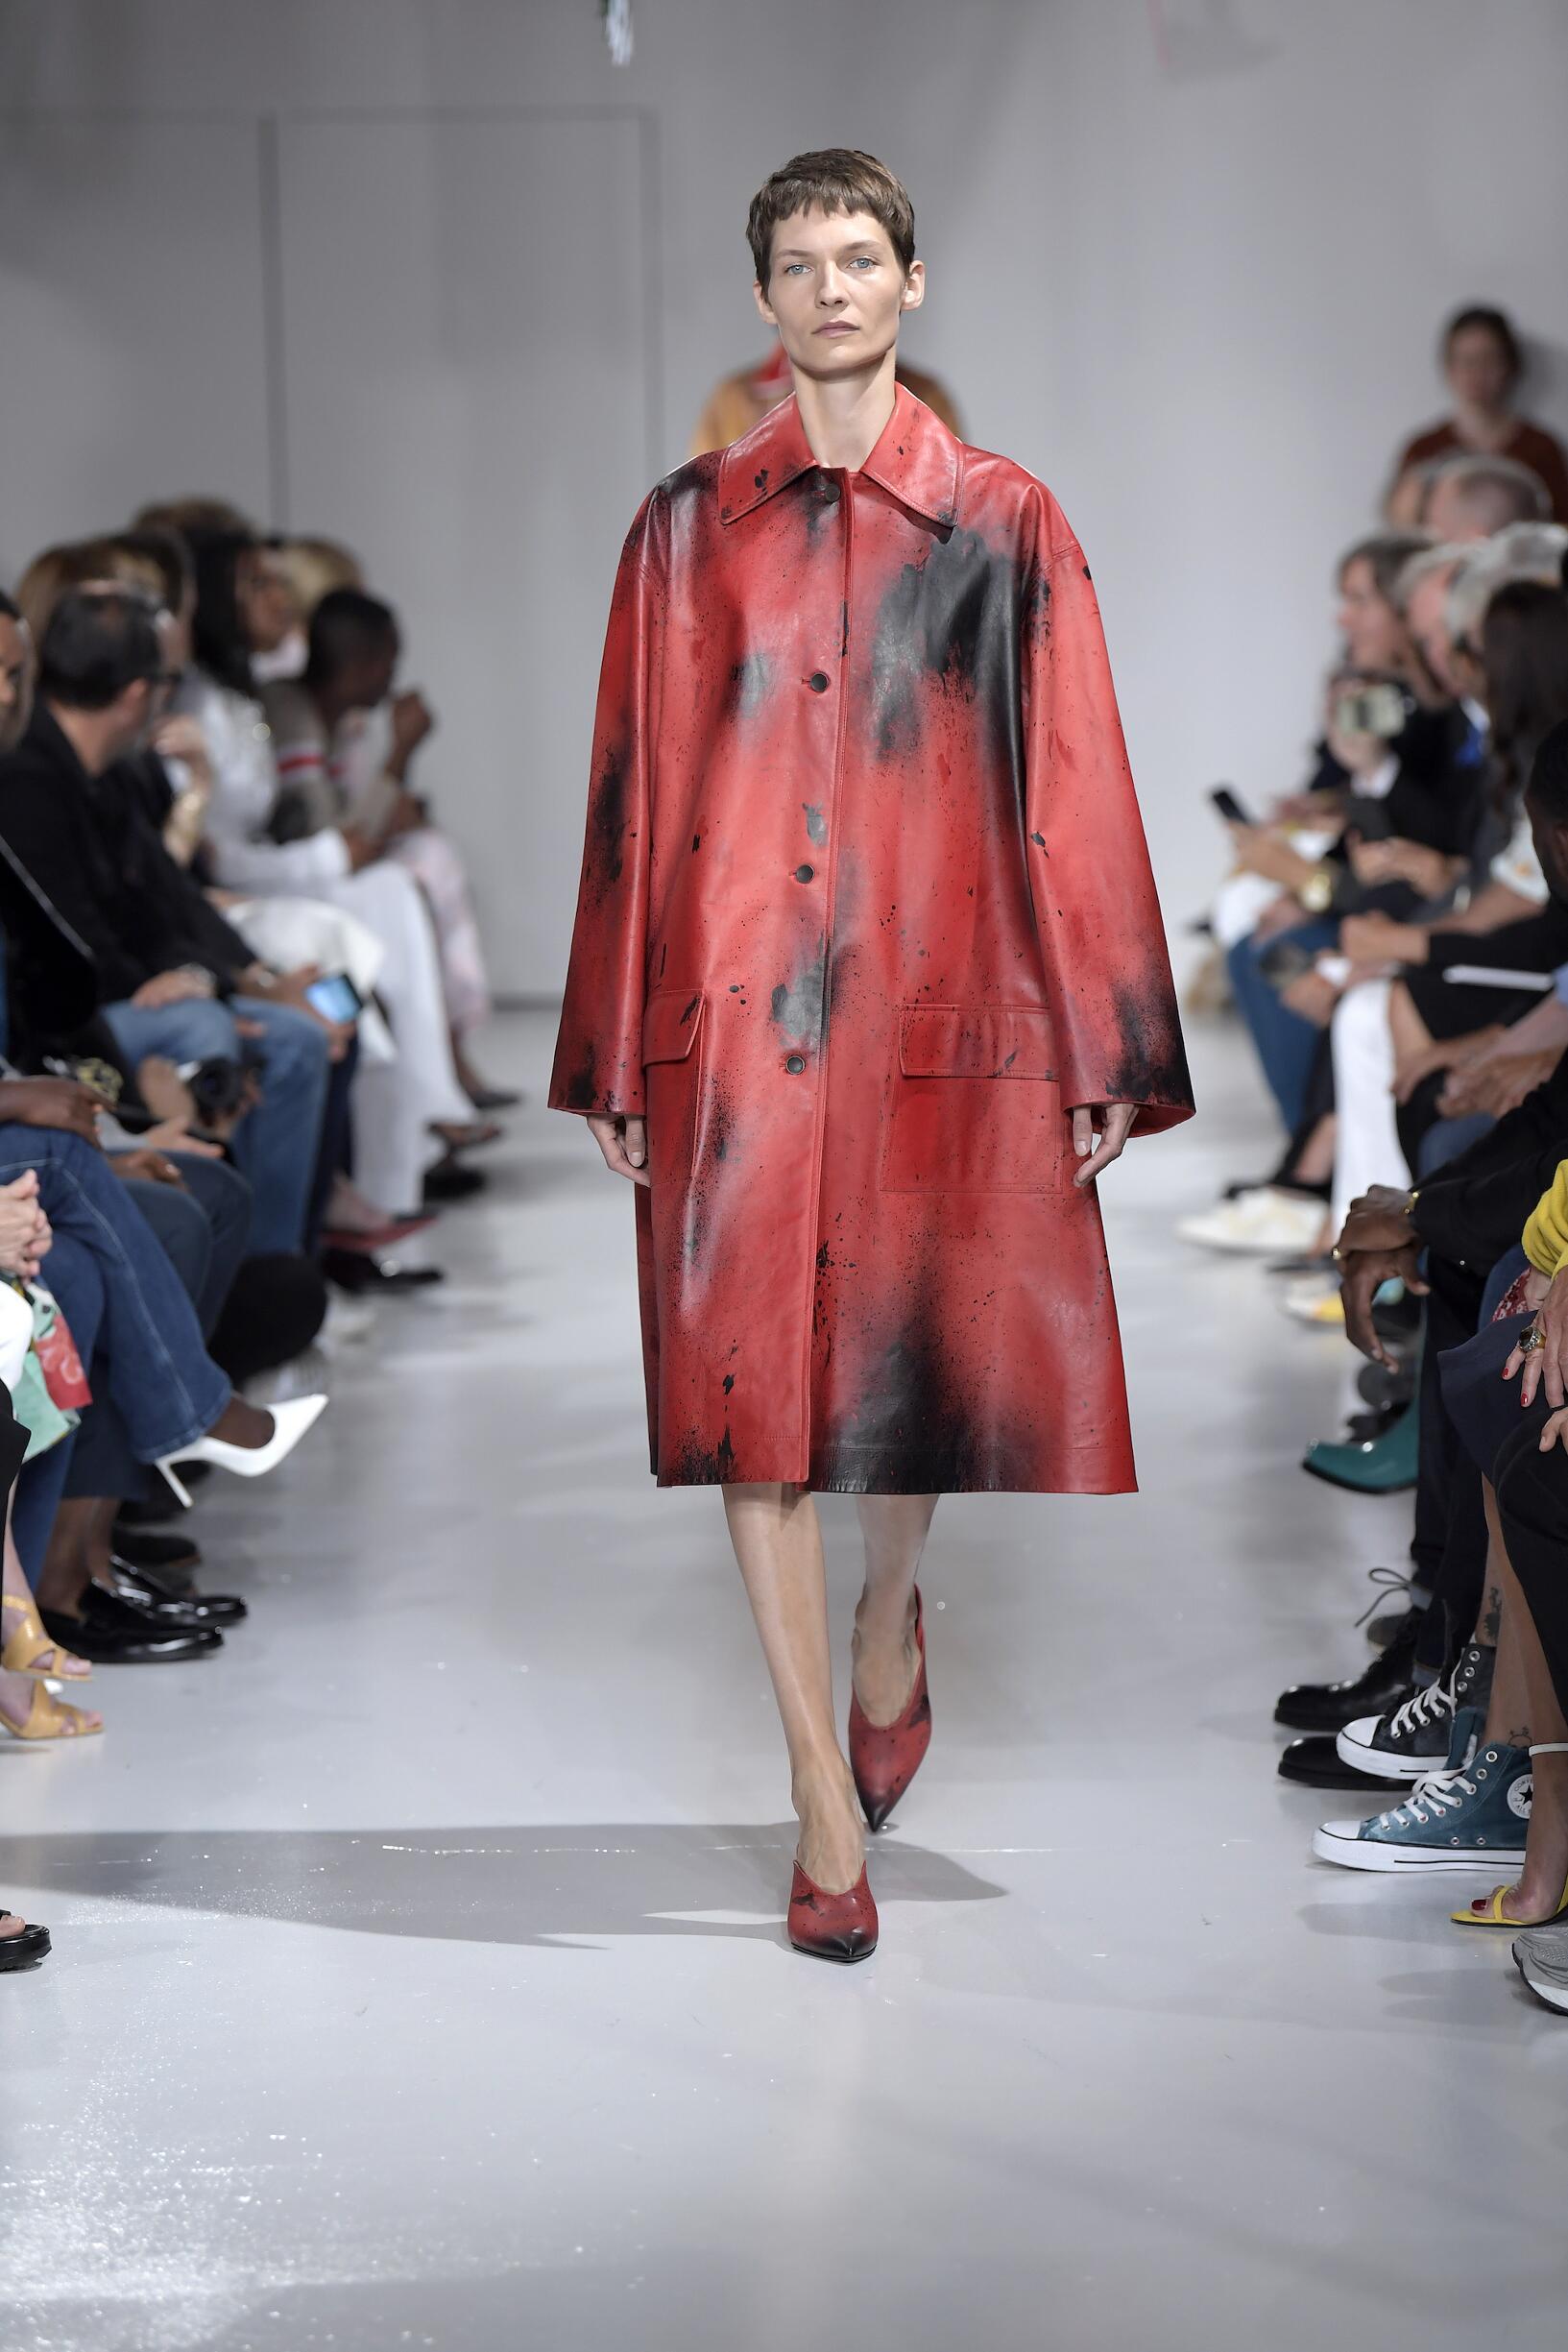 Spring Fashion Trends 2018 Calvin Klein 205W39NYC